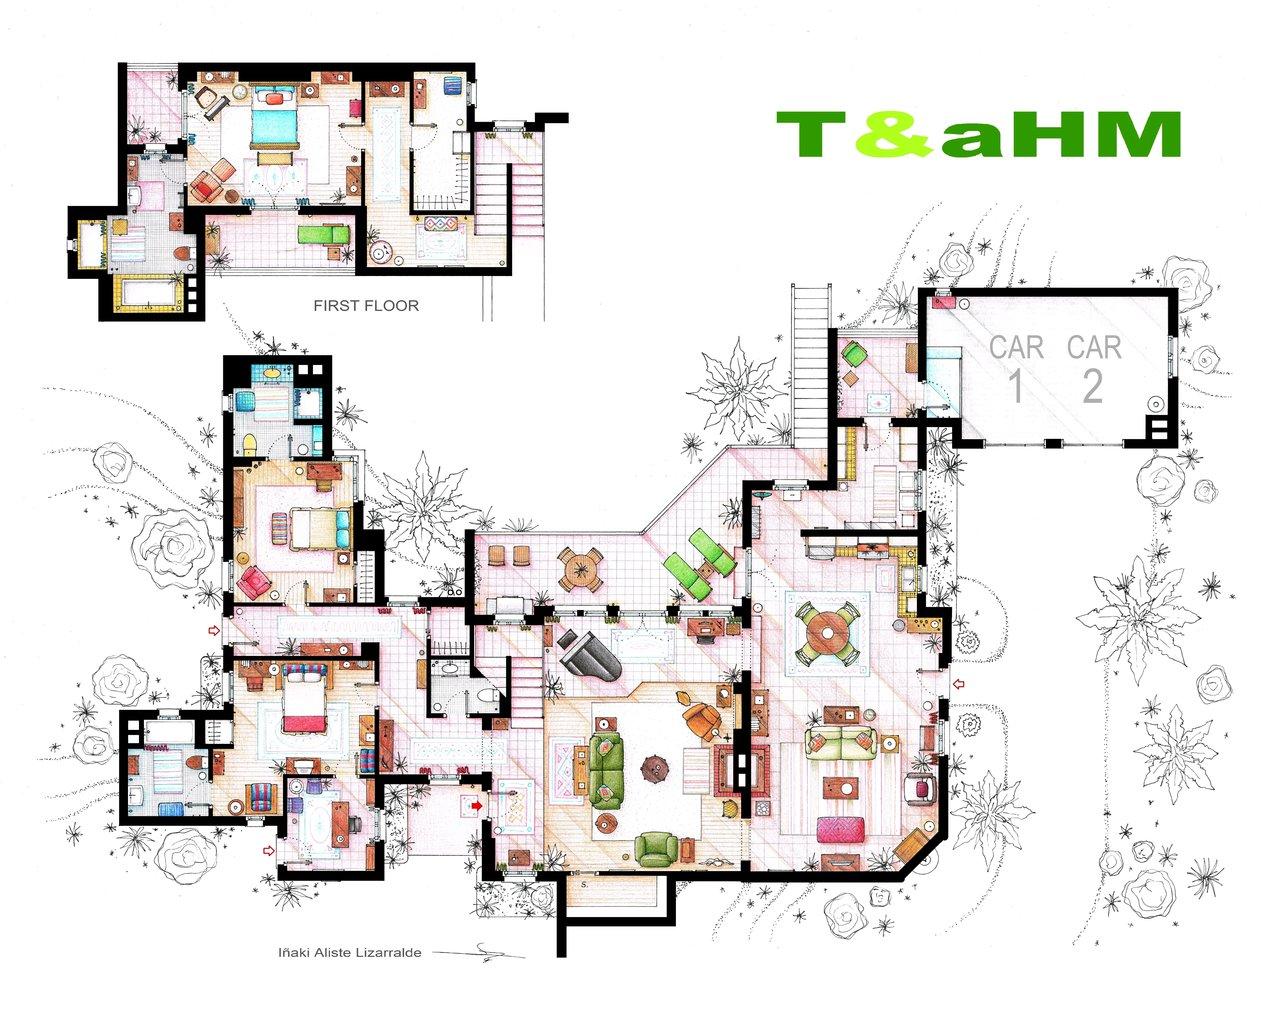 Two and a Half Men floorplan